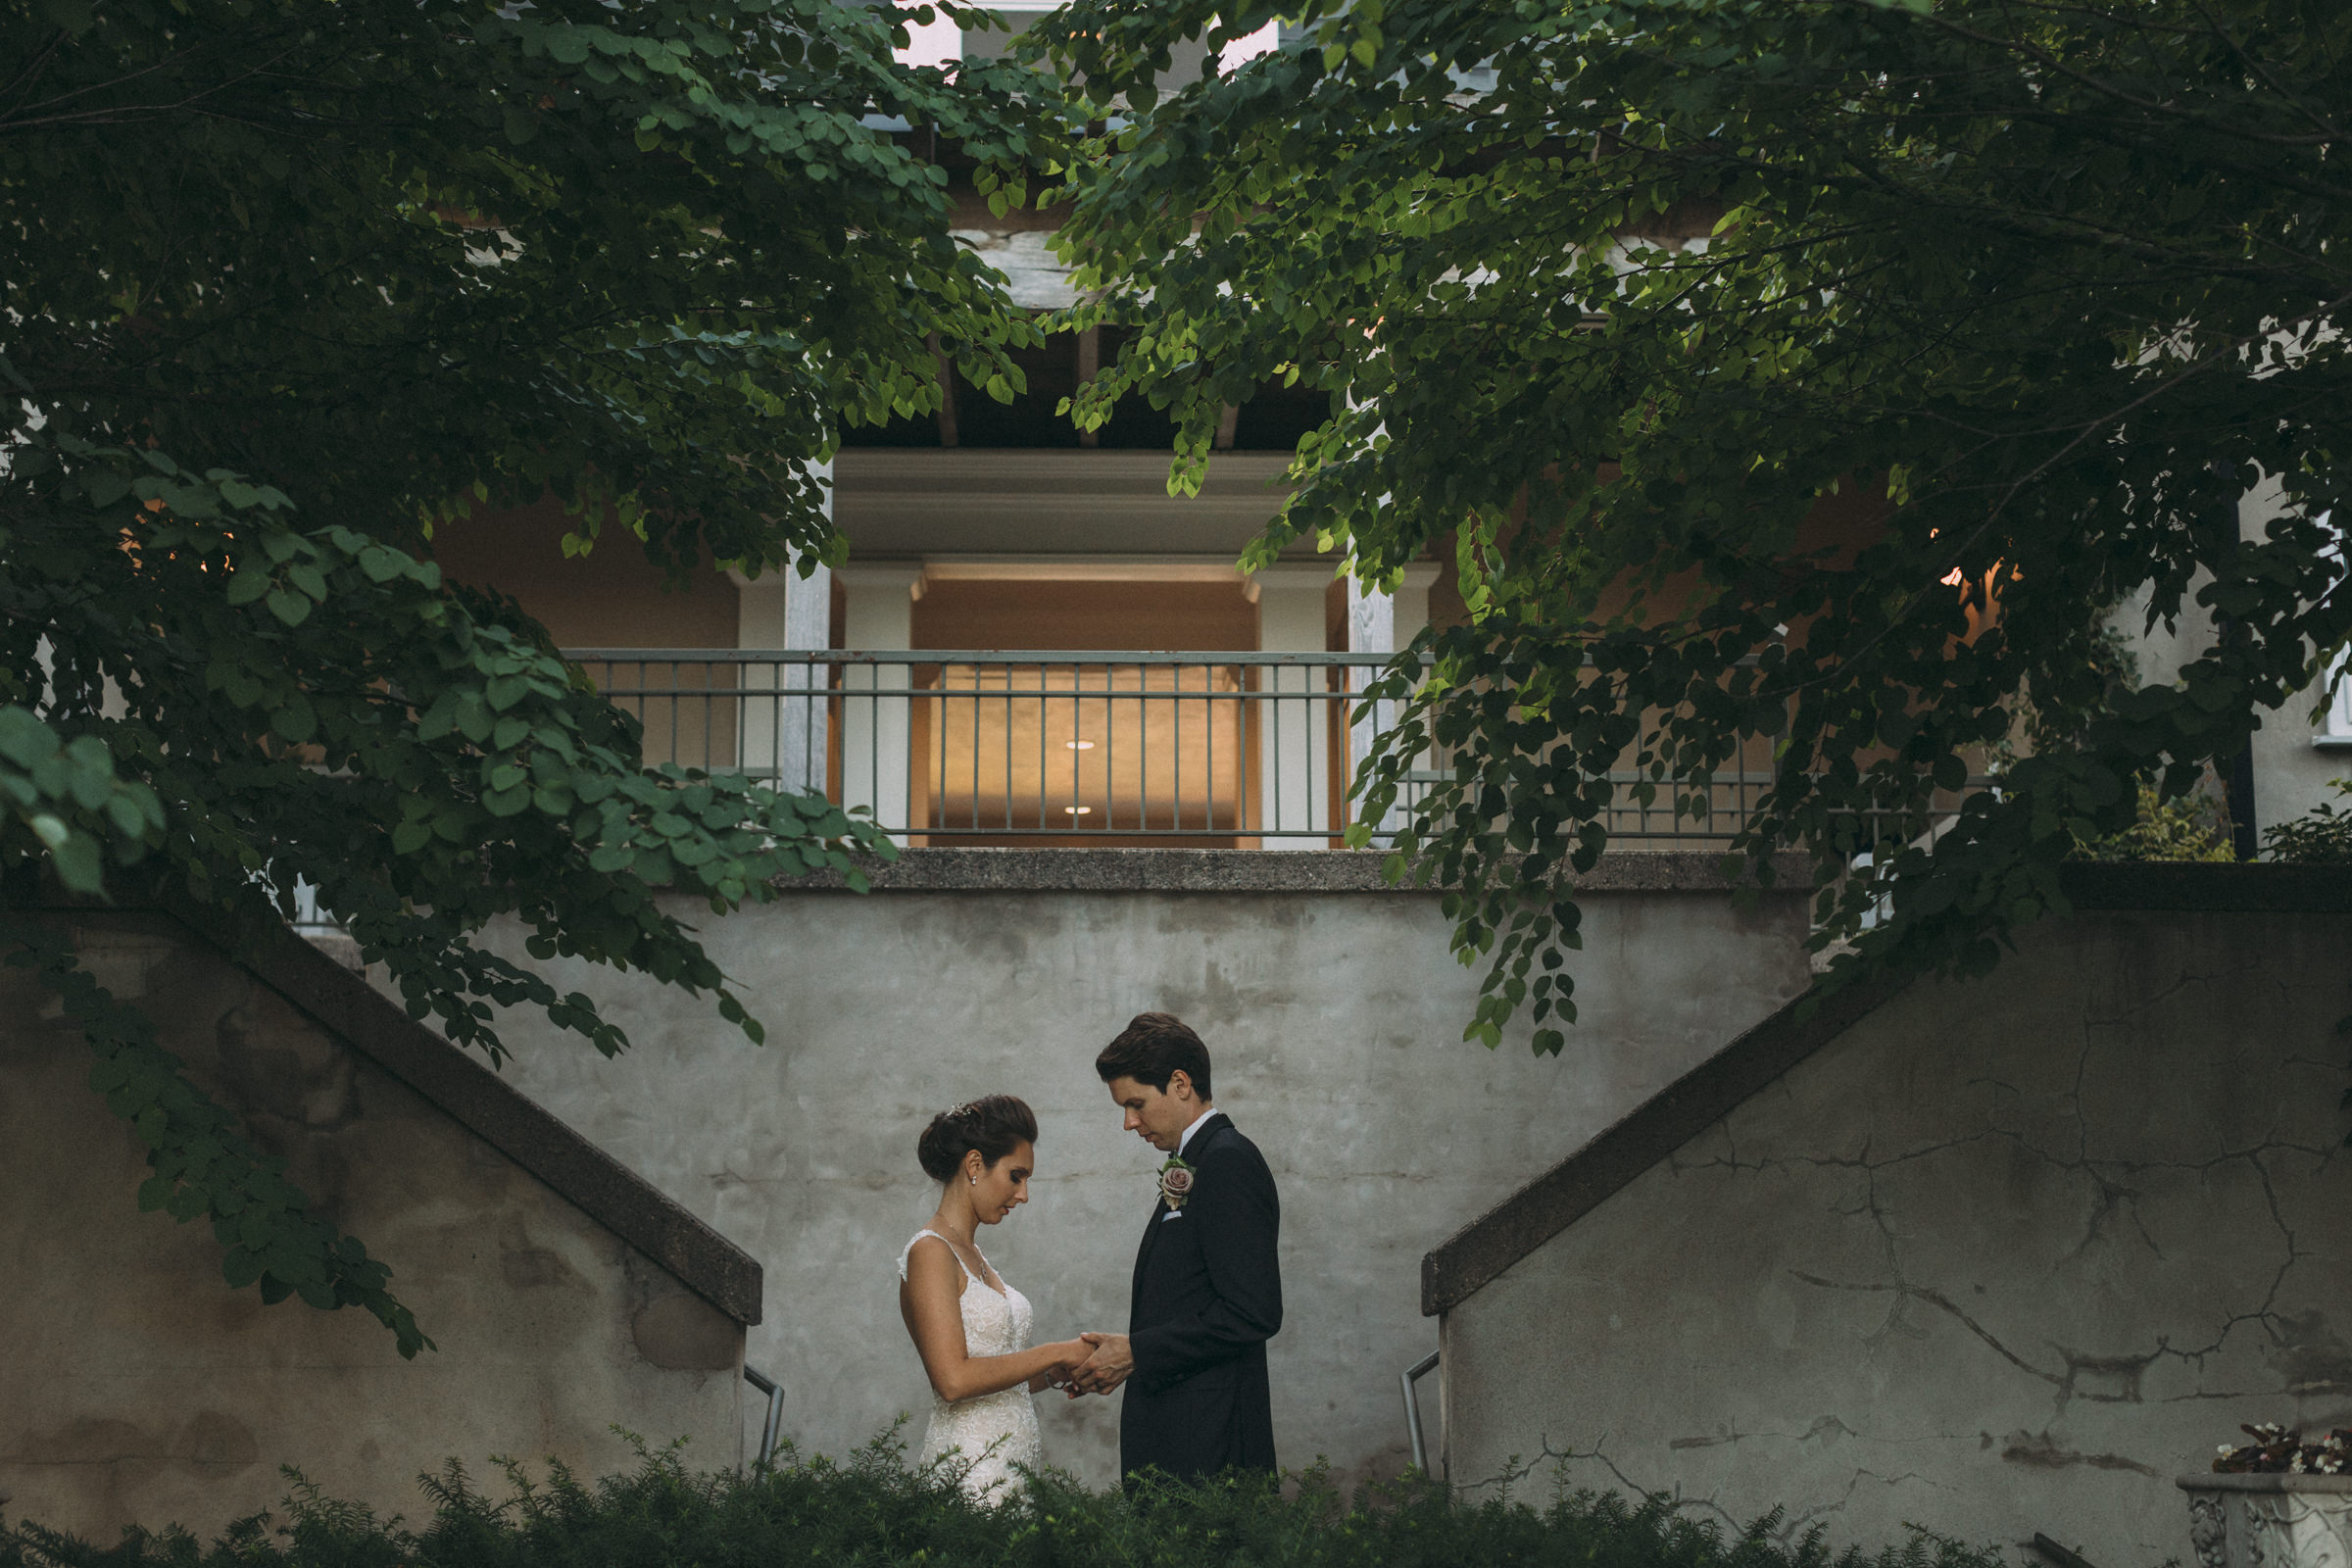 Langdon-Hall-wedding-photography-Cambridge-by-Sam-Wong-of-Visual-Cravings_Sarah-Ryan_41.jpg